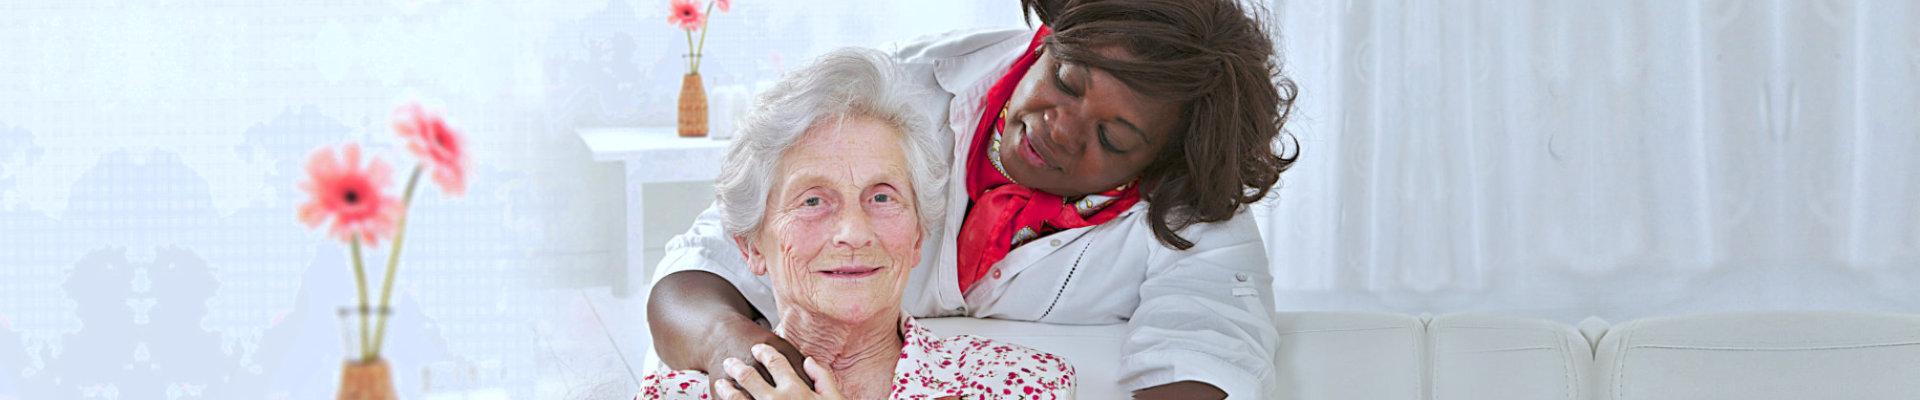 caregiver hugging a senior woman